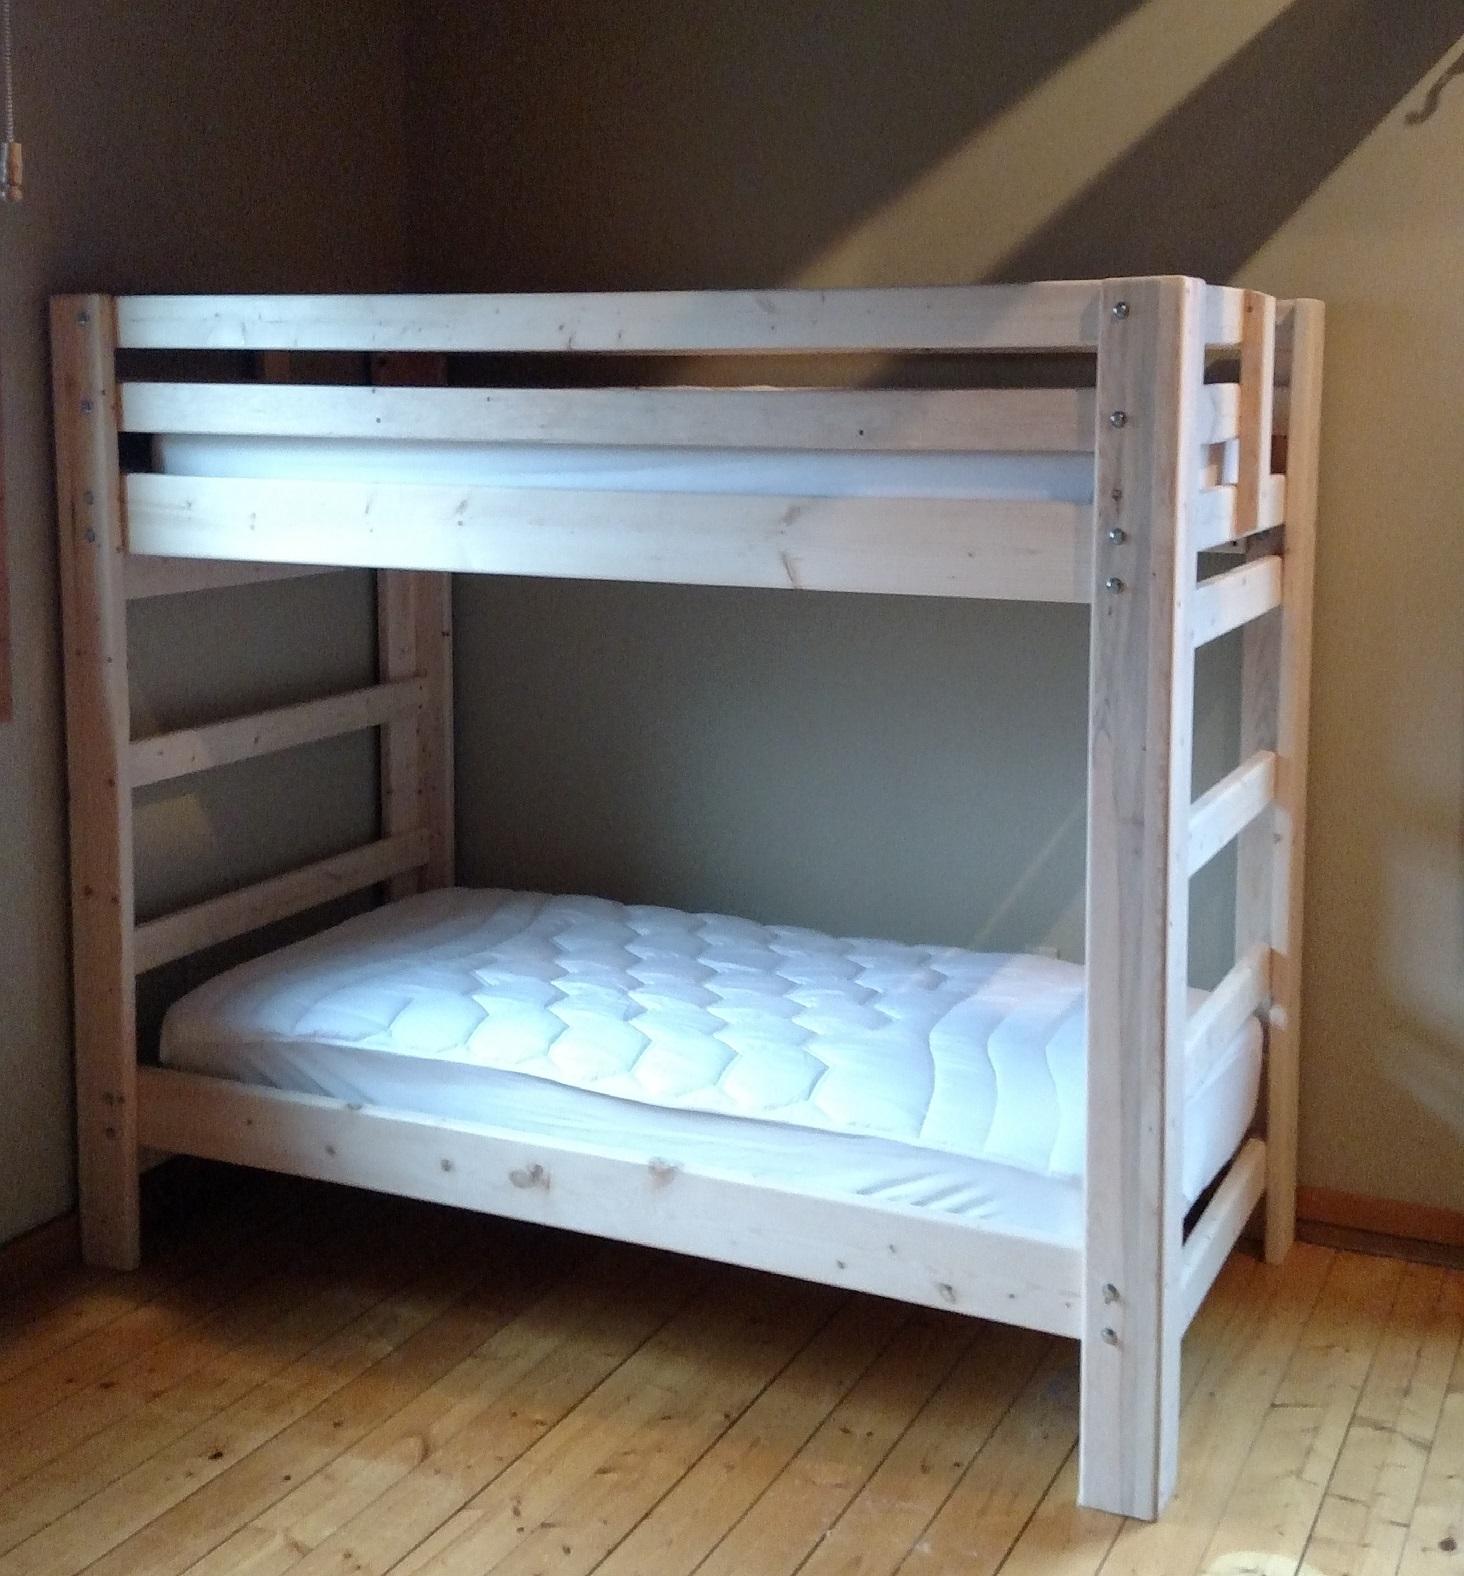 slanted bed low high fans bunk info loft beds ceiling hesstonspeedway